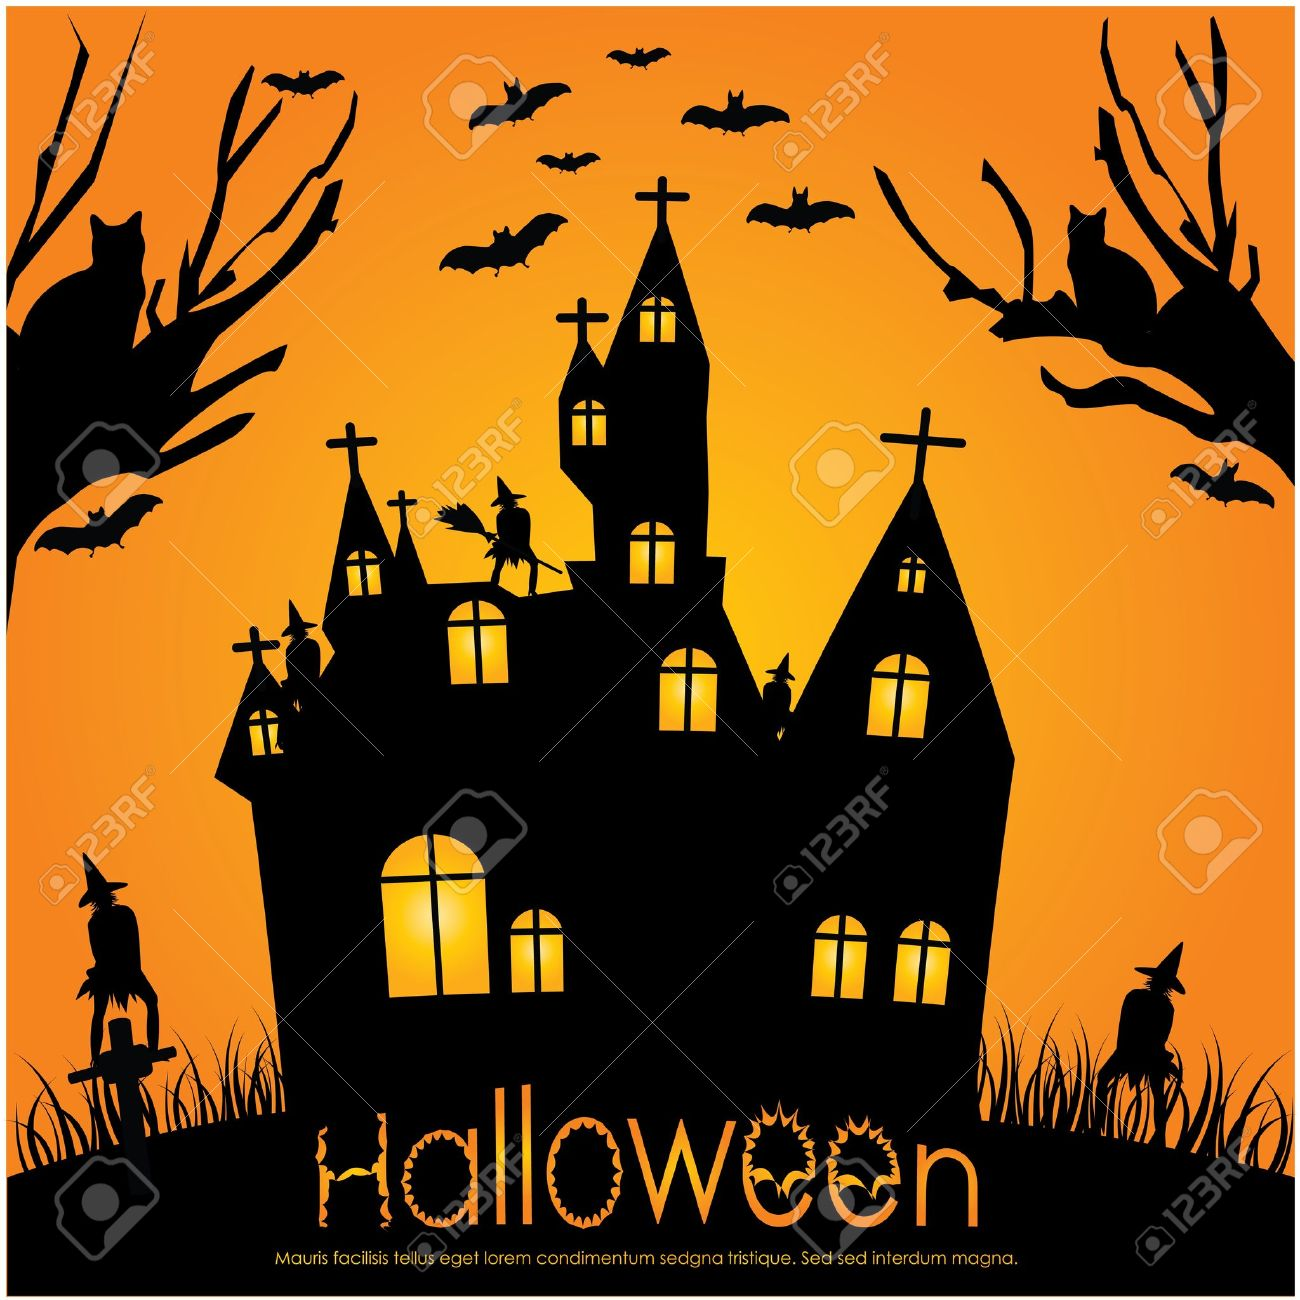 Halloween invitation royalty free cliparts vectors and stock halloween invitation stock vector 10421425 stopboris Gallery